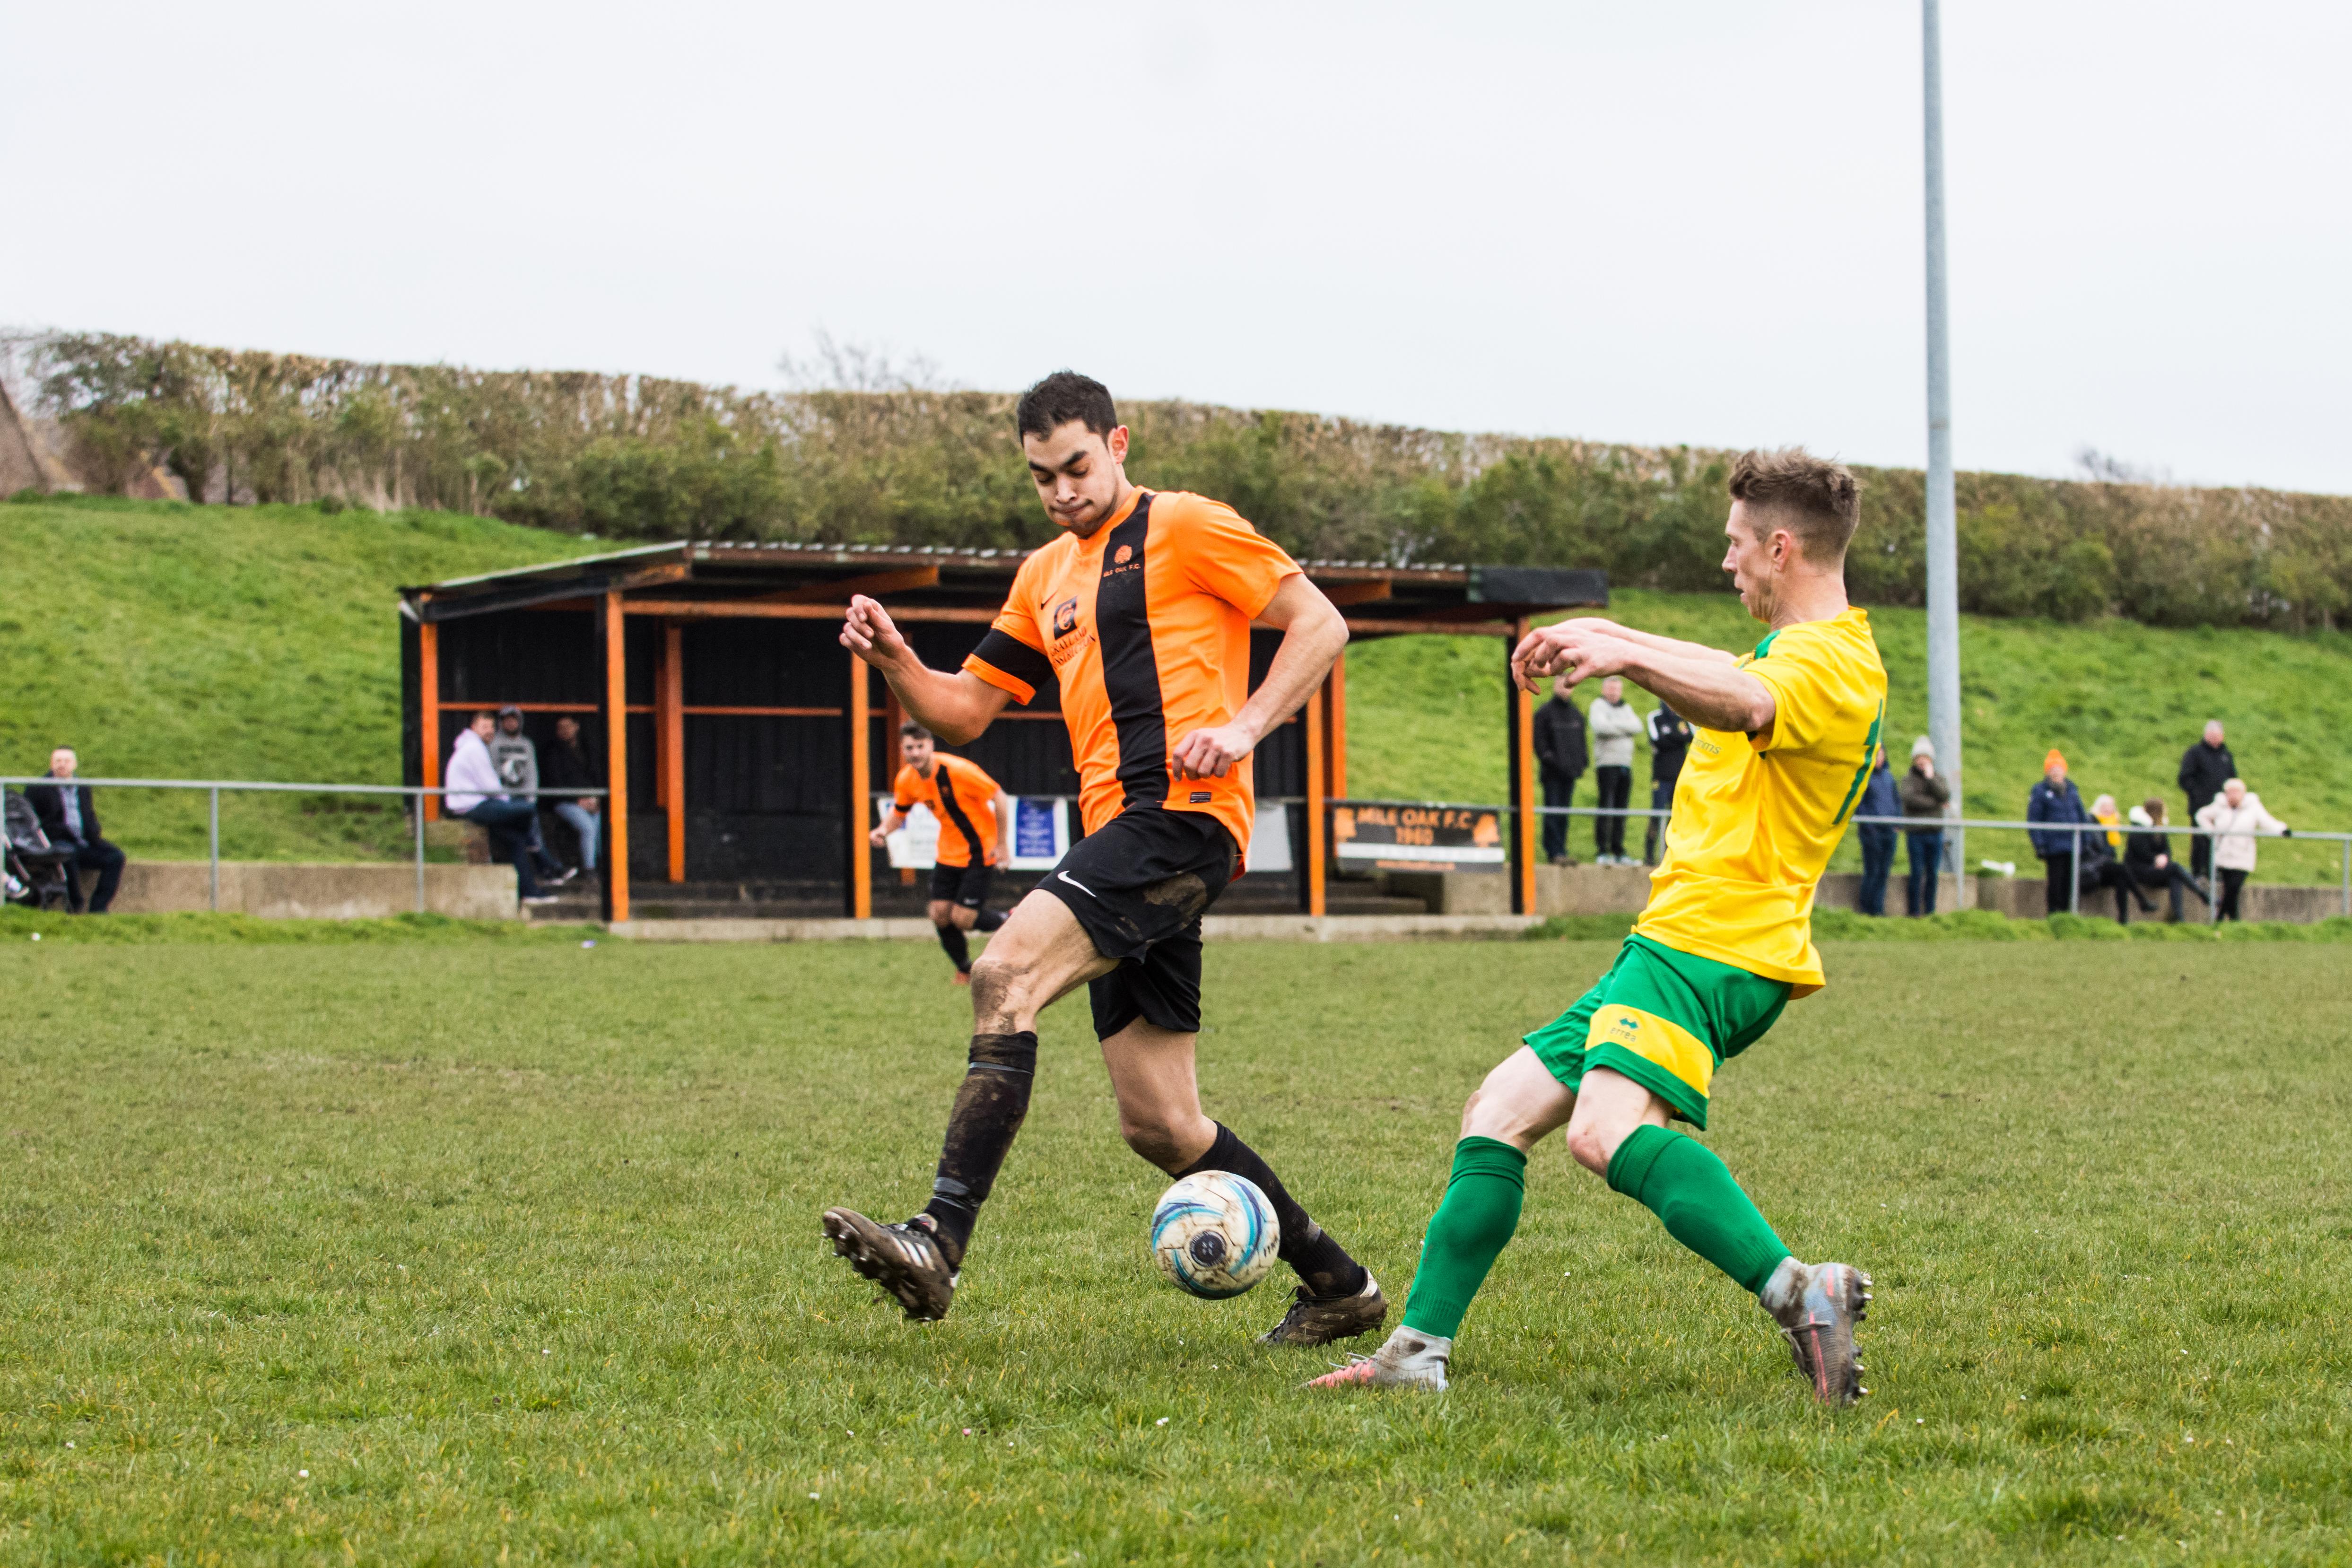 DAVID_JEFFERY Mile Oak FC vs Hailsham Town FC 24.03.18 71